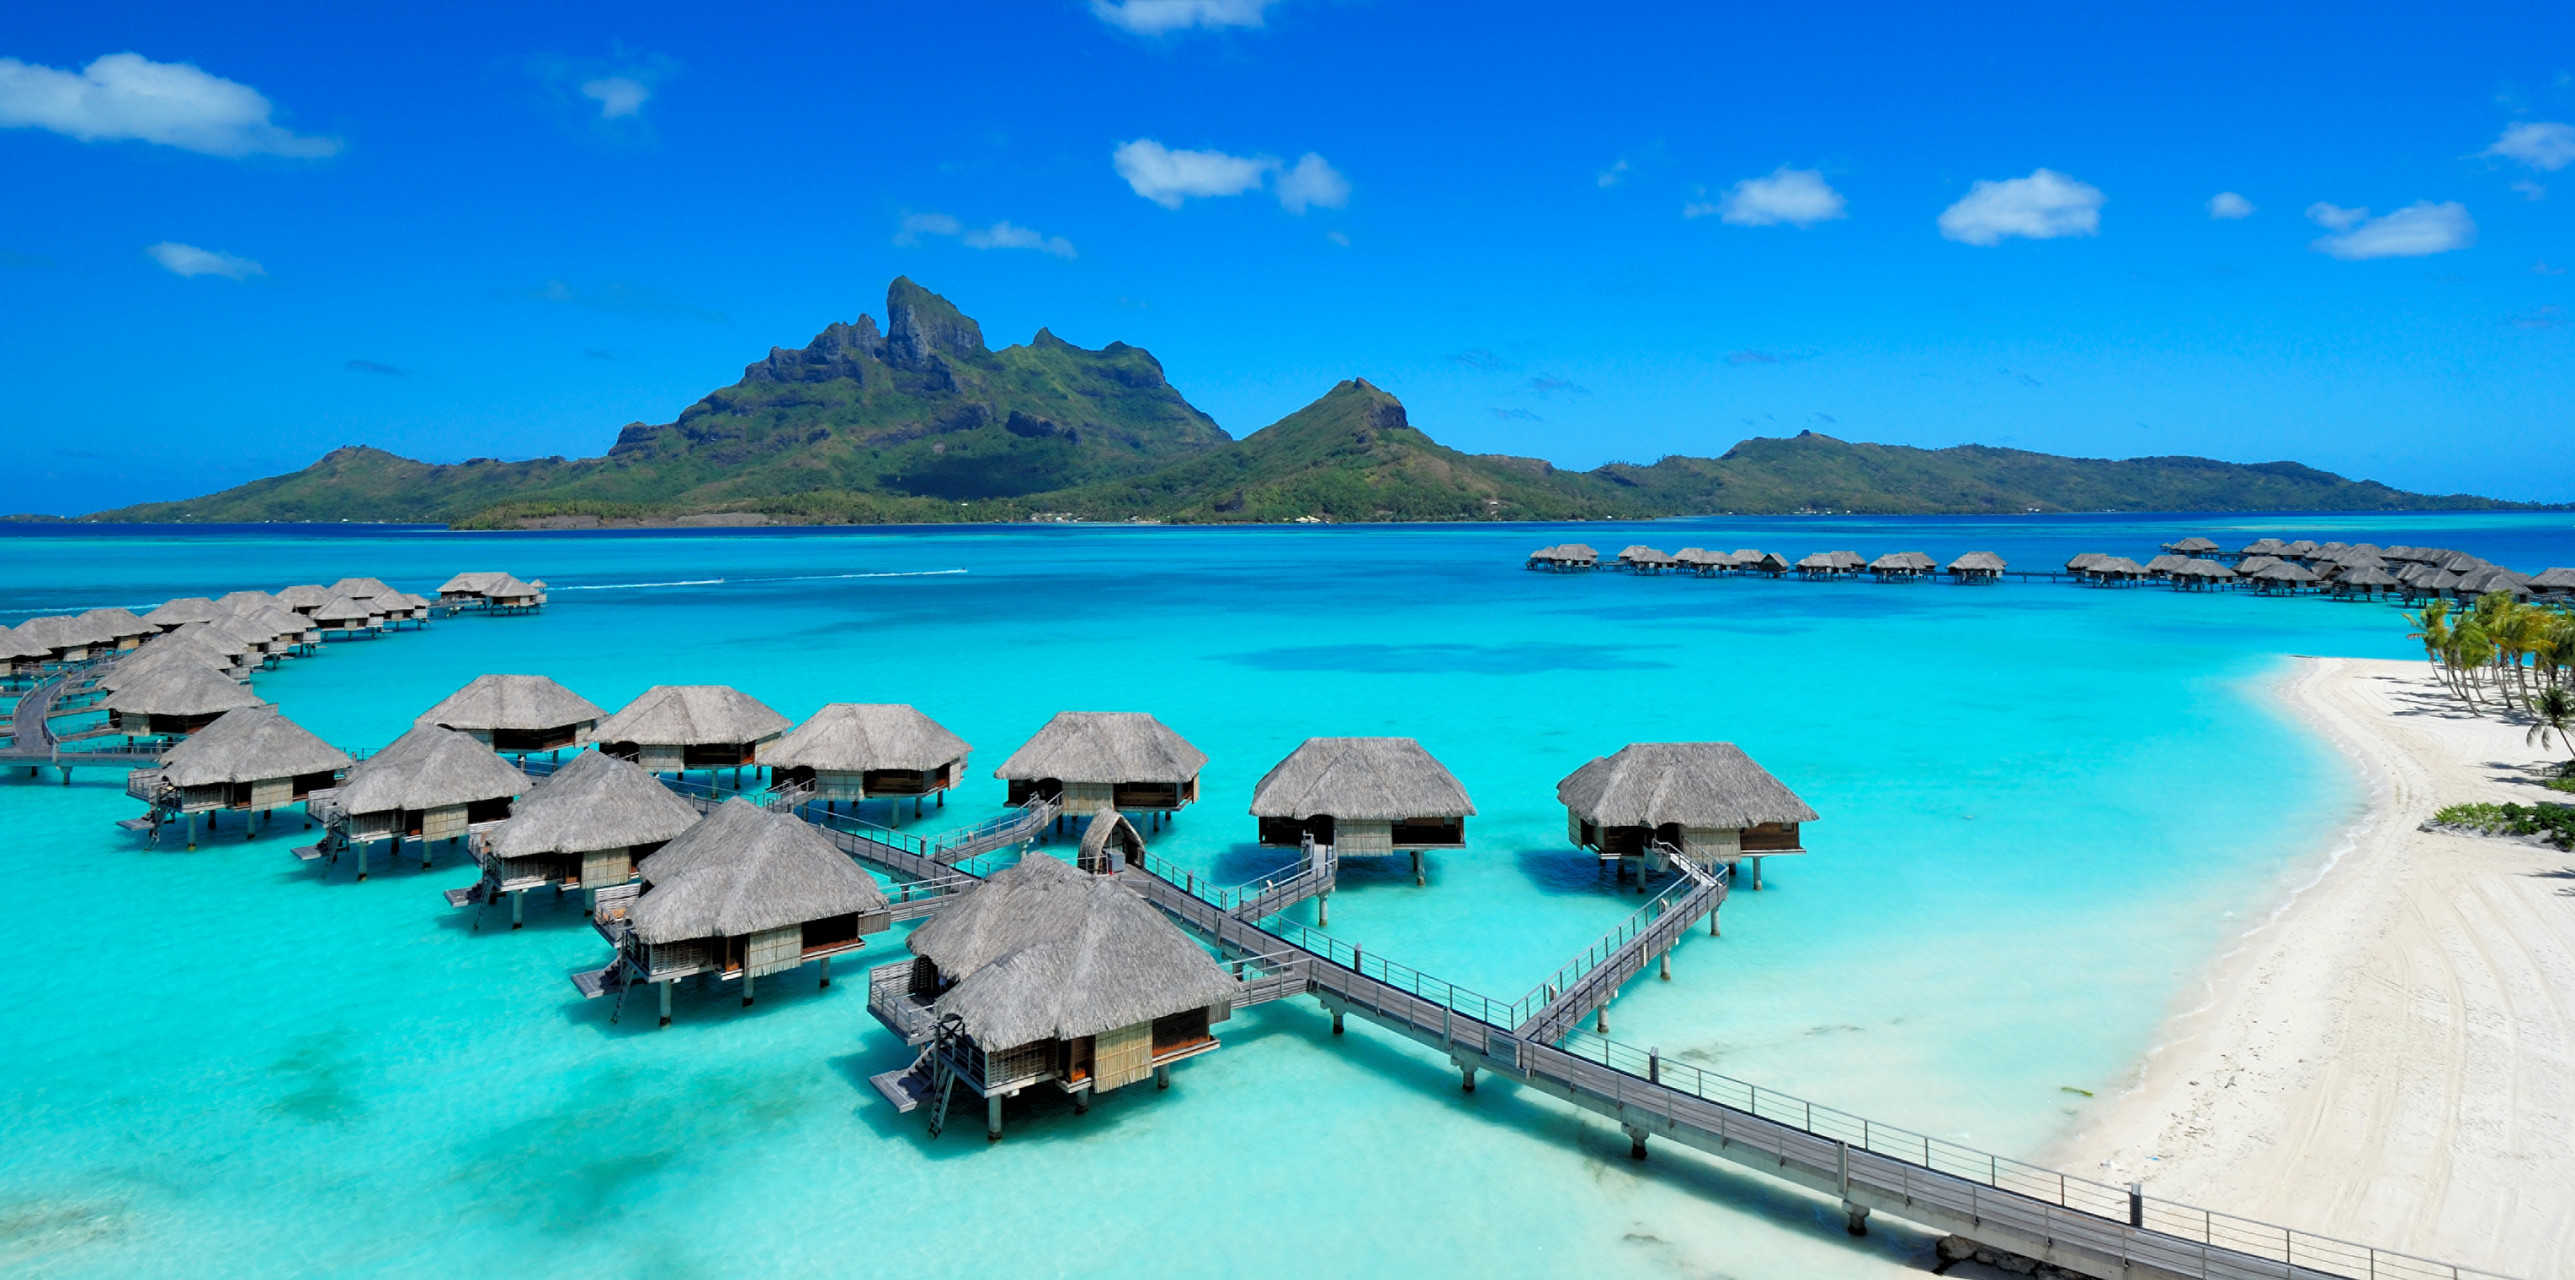 sejour à Tahiti, Moorea, Bora Bora